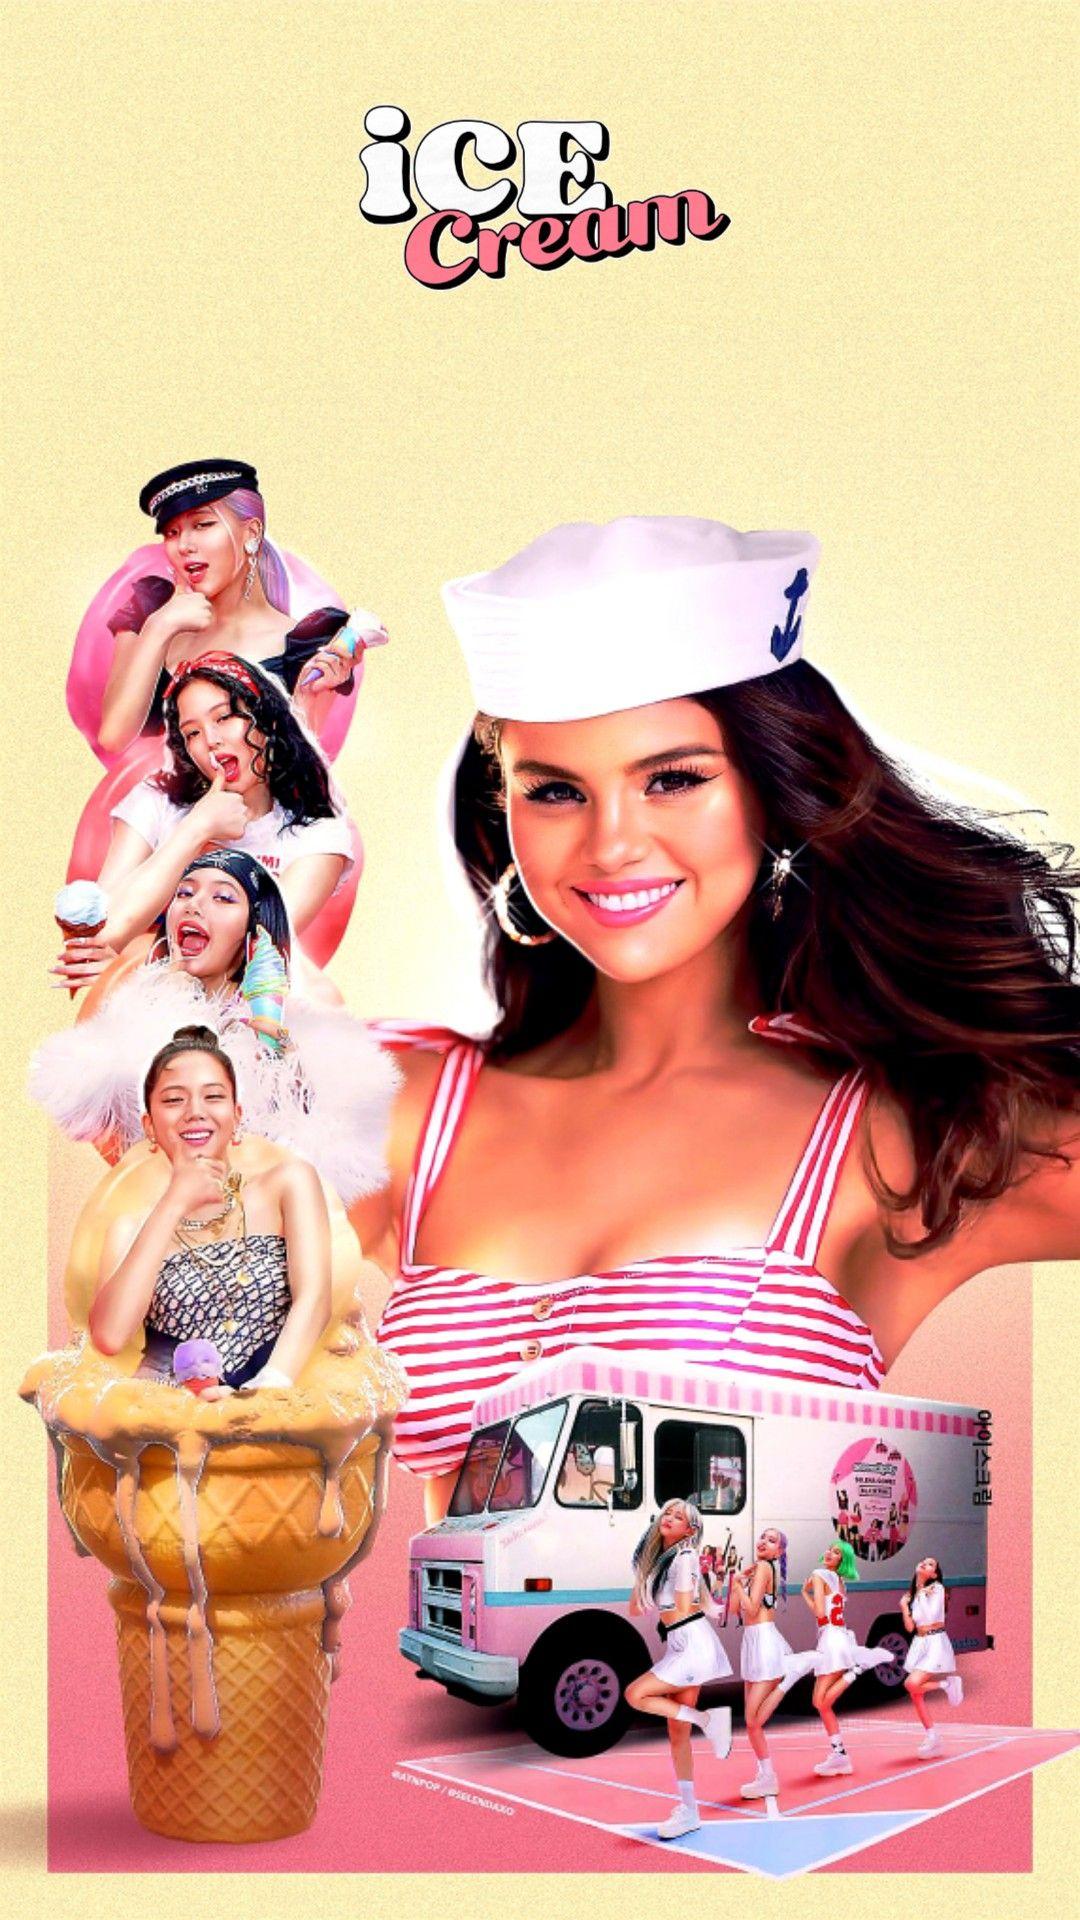 Ice Cream Blackpink X Selena Gomez Wallpaper Art From Twitter Selendaxo In 2020 Selena Gomez Wallpaper Blackpink Ice Cream Wallpaper